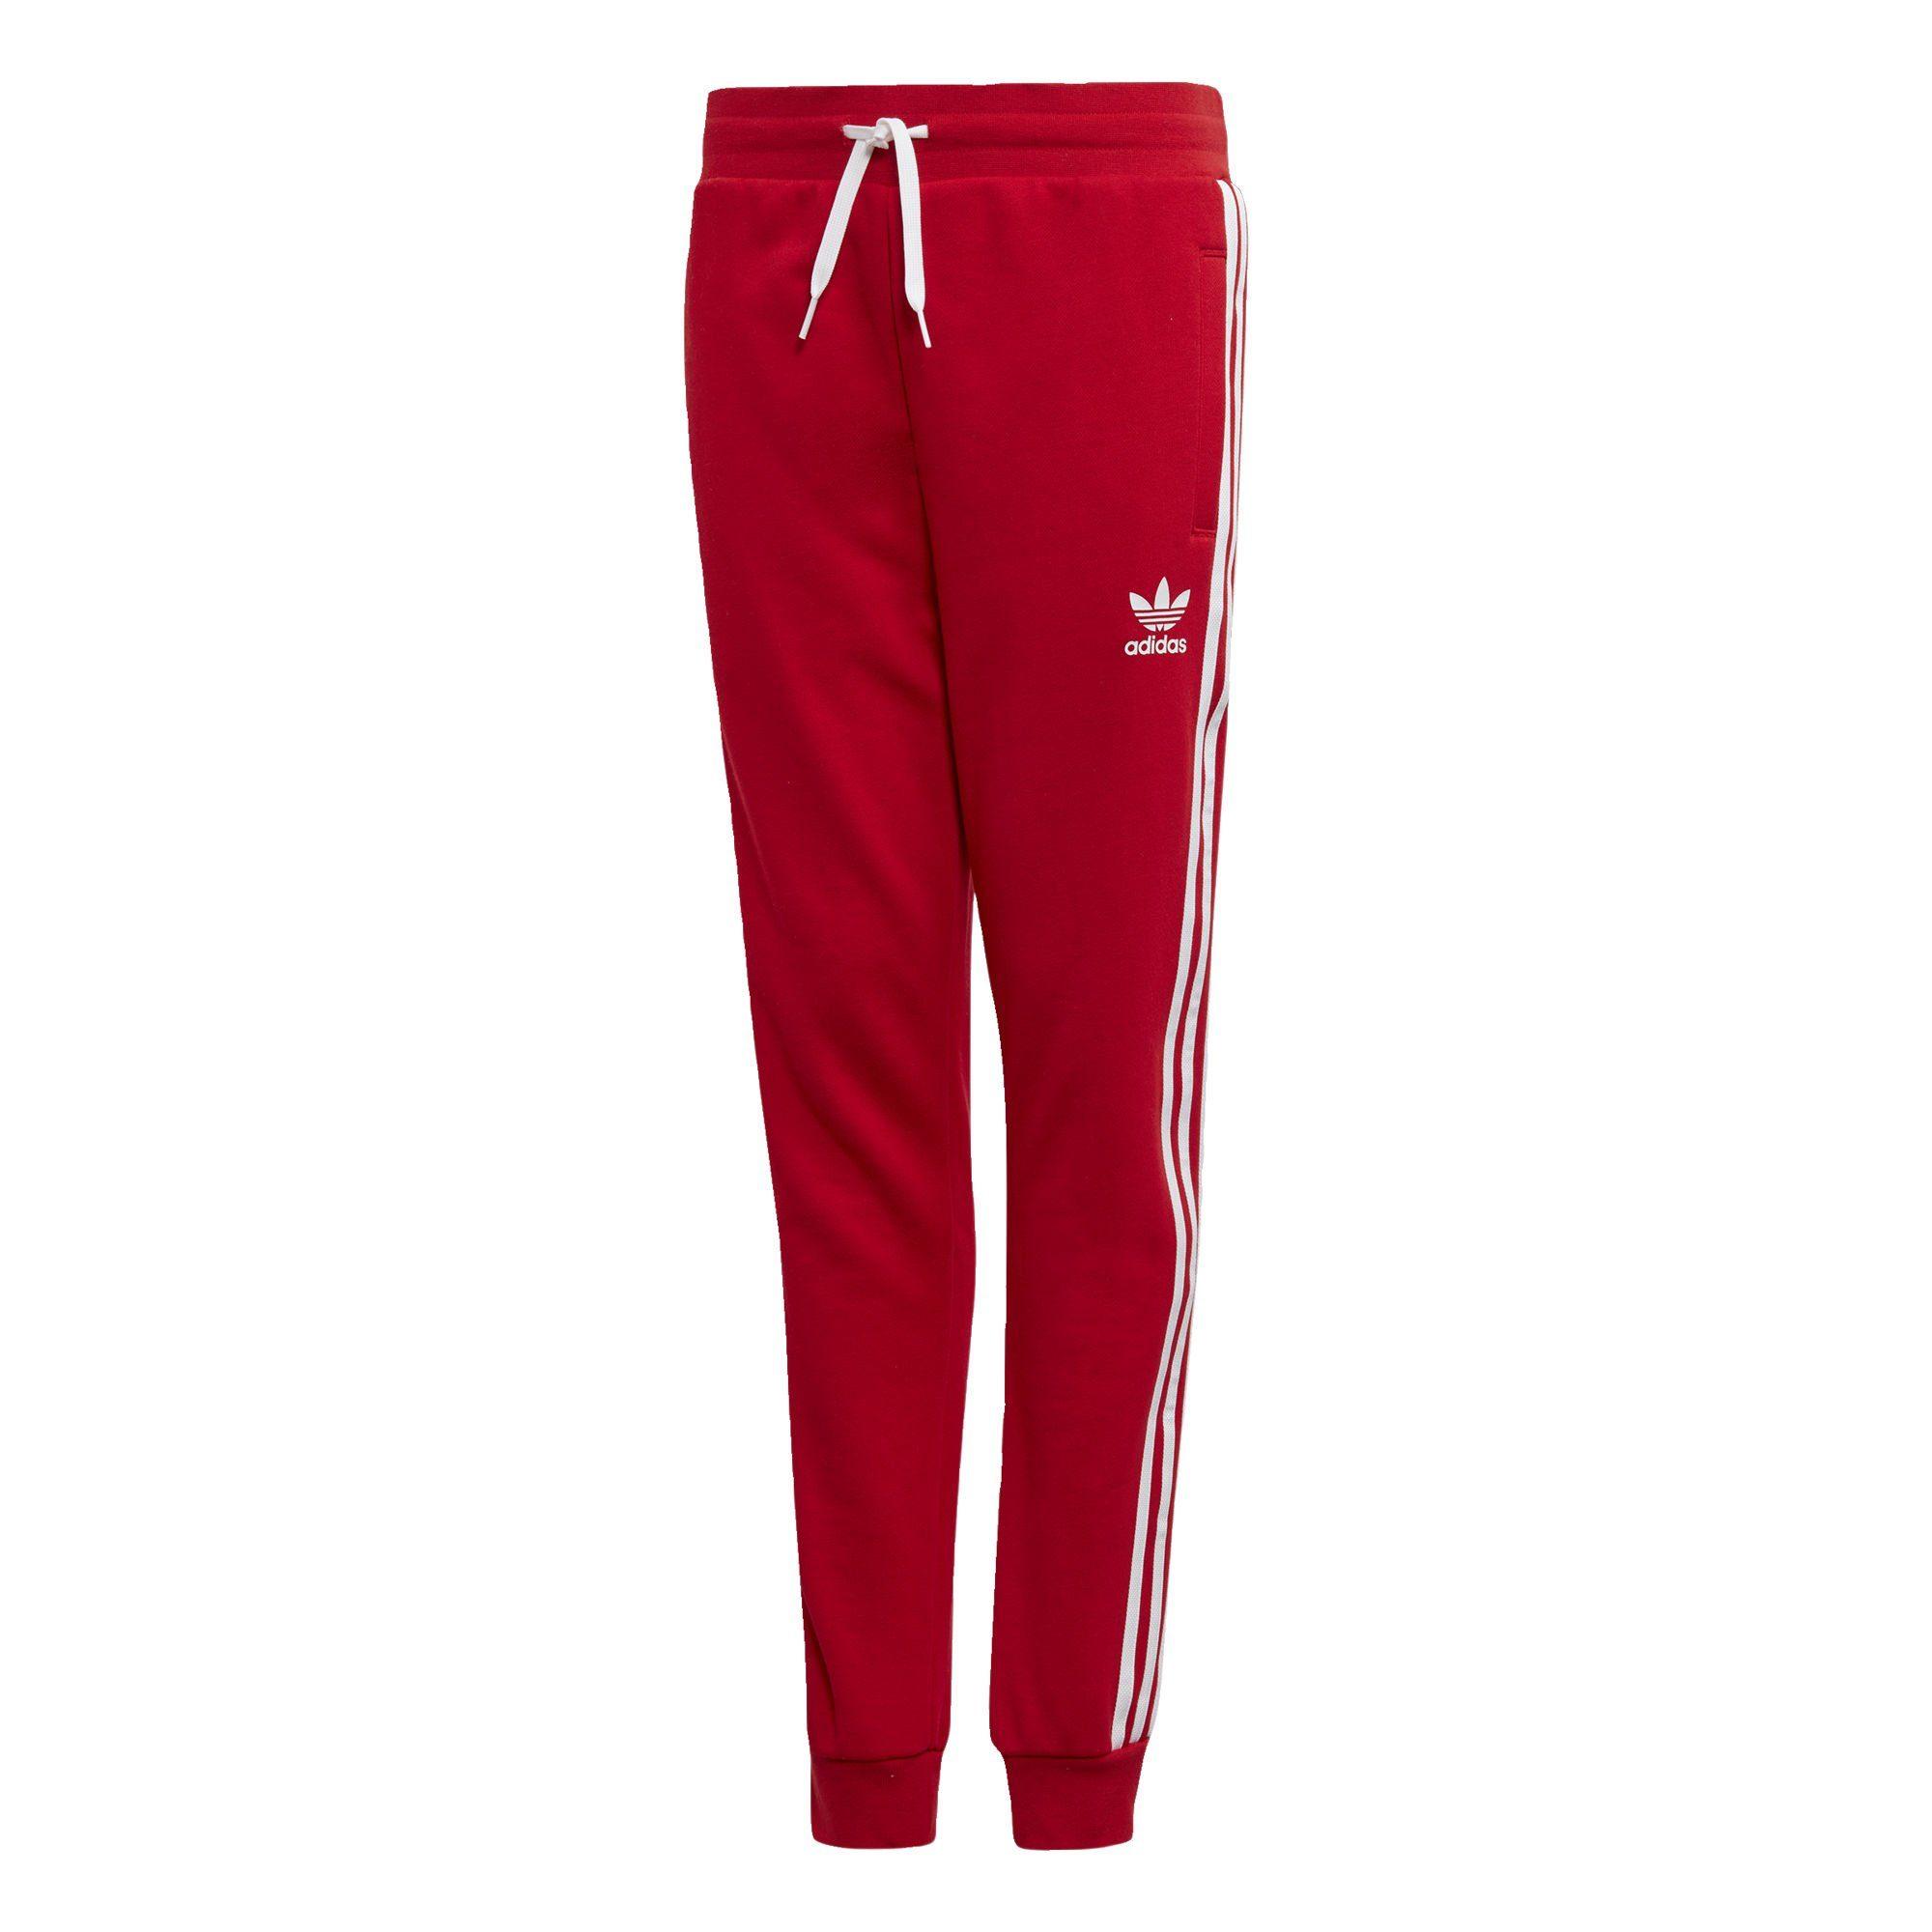 adidas Originals Trainingshose »3 Streifen Hose« adicolor online kaufen   OTTO